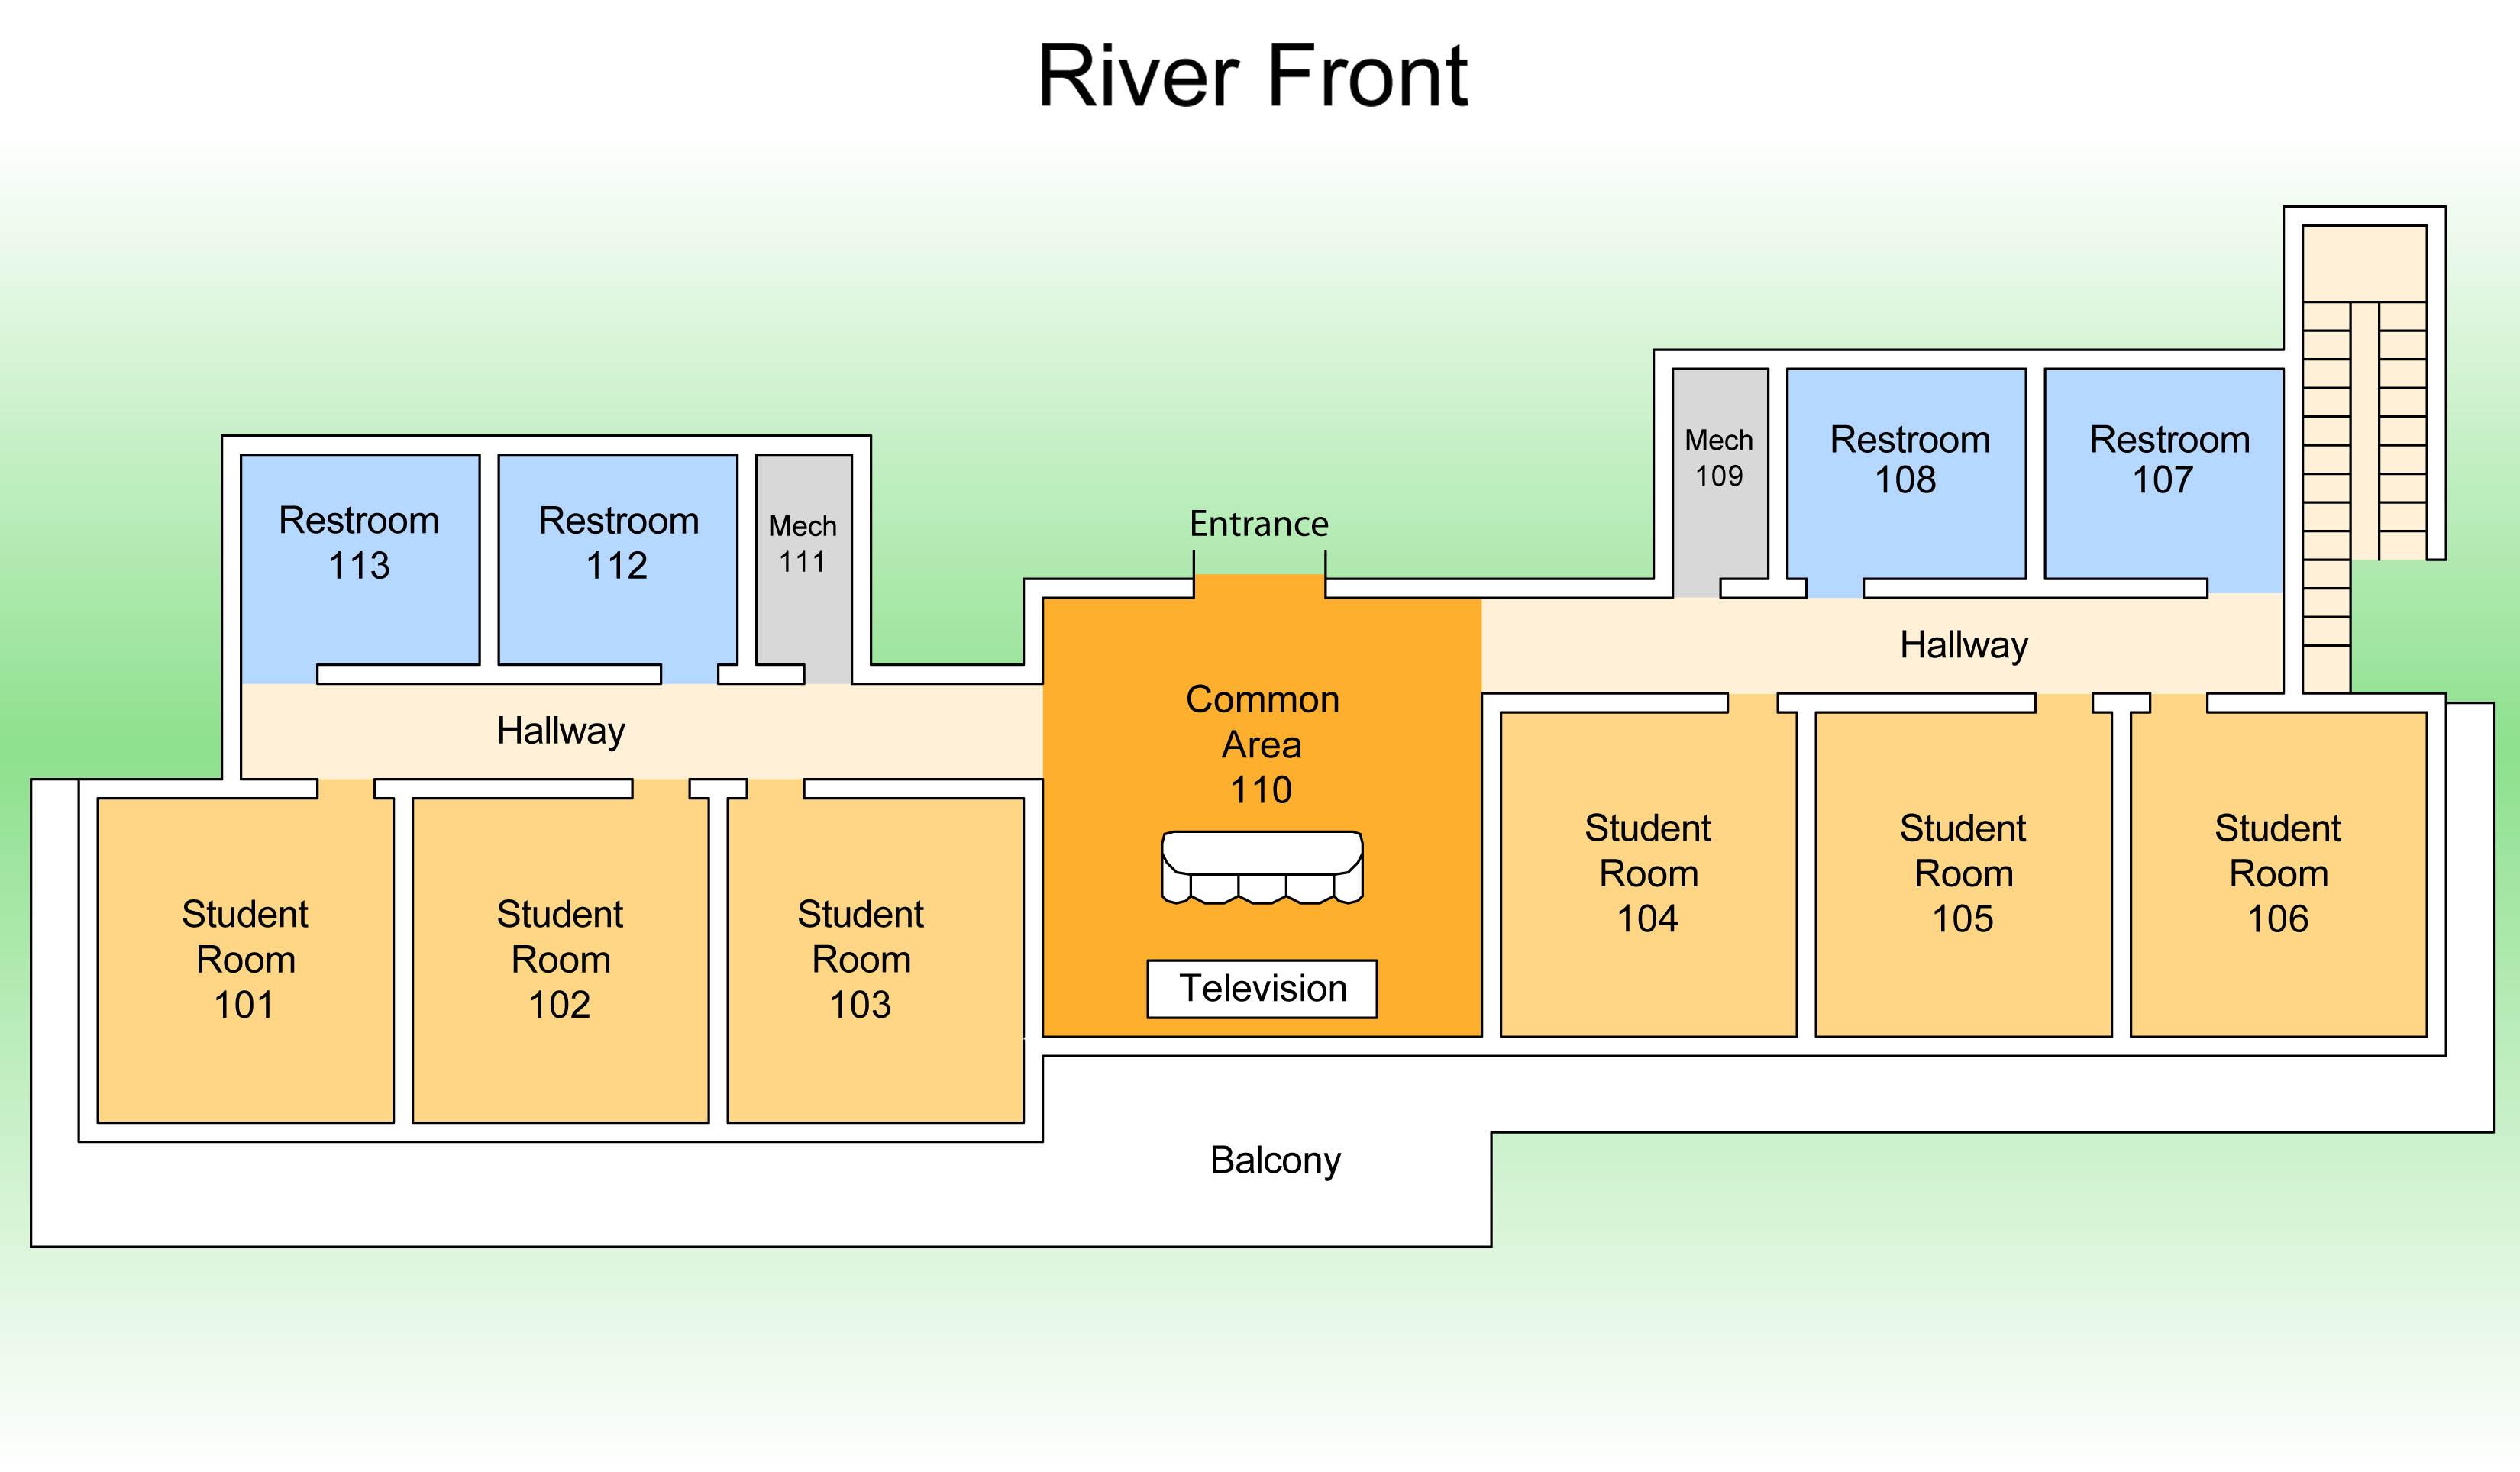 CRS Riverfront